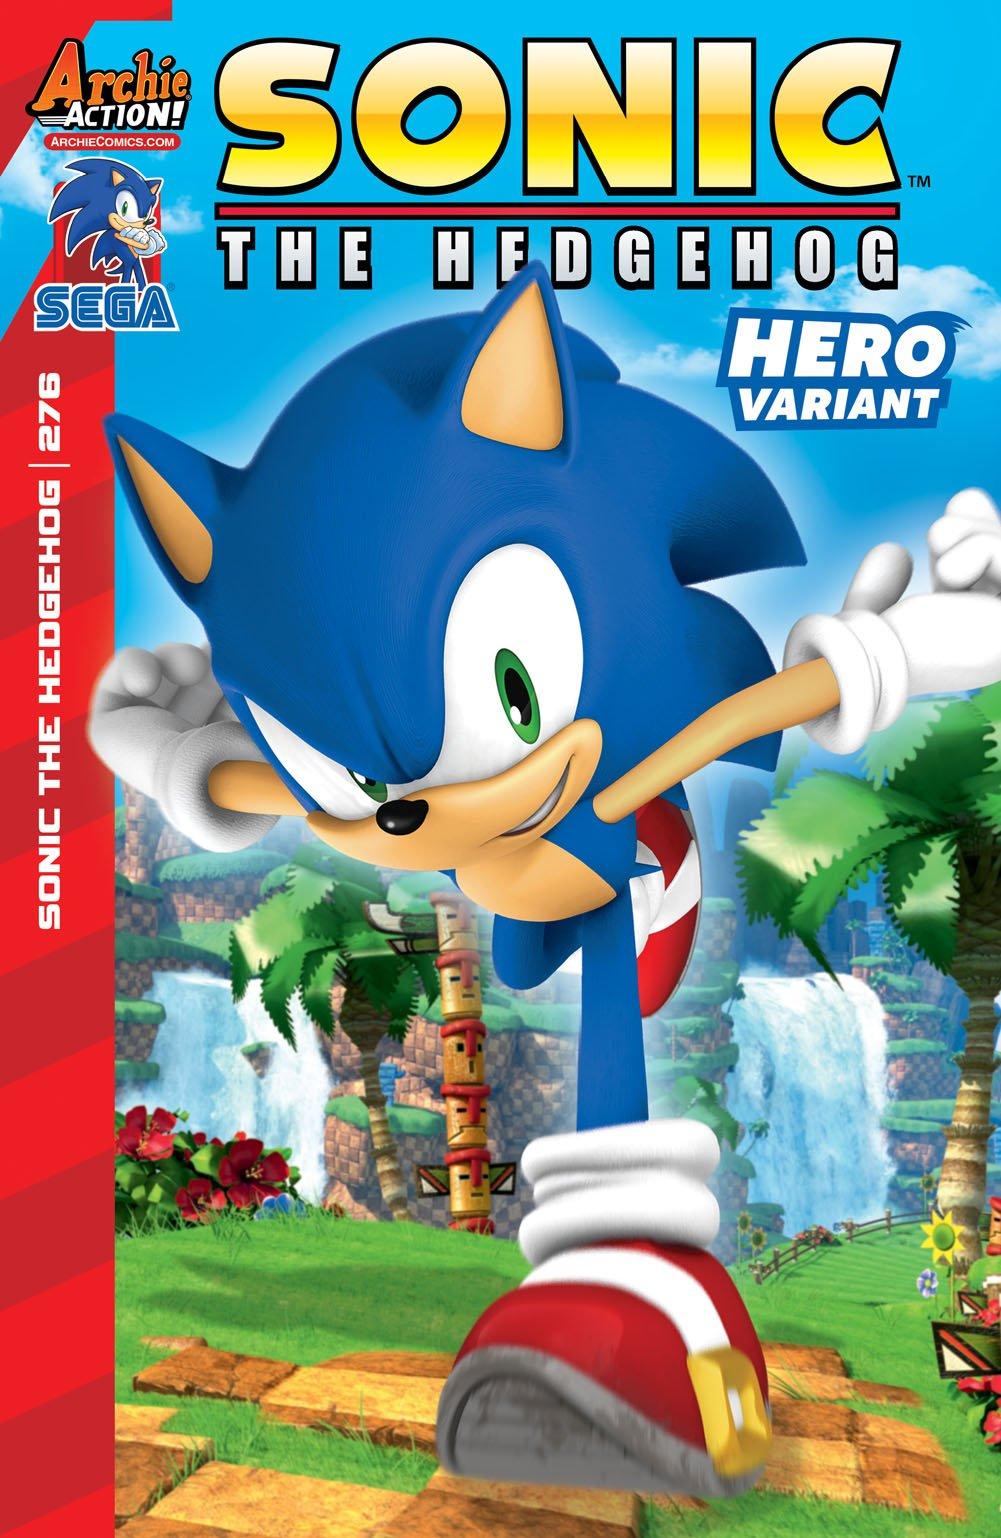 Sonic the Hedgehog 276 (November 2015) (variant edition)